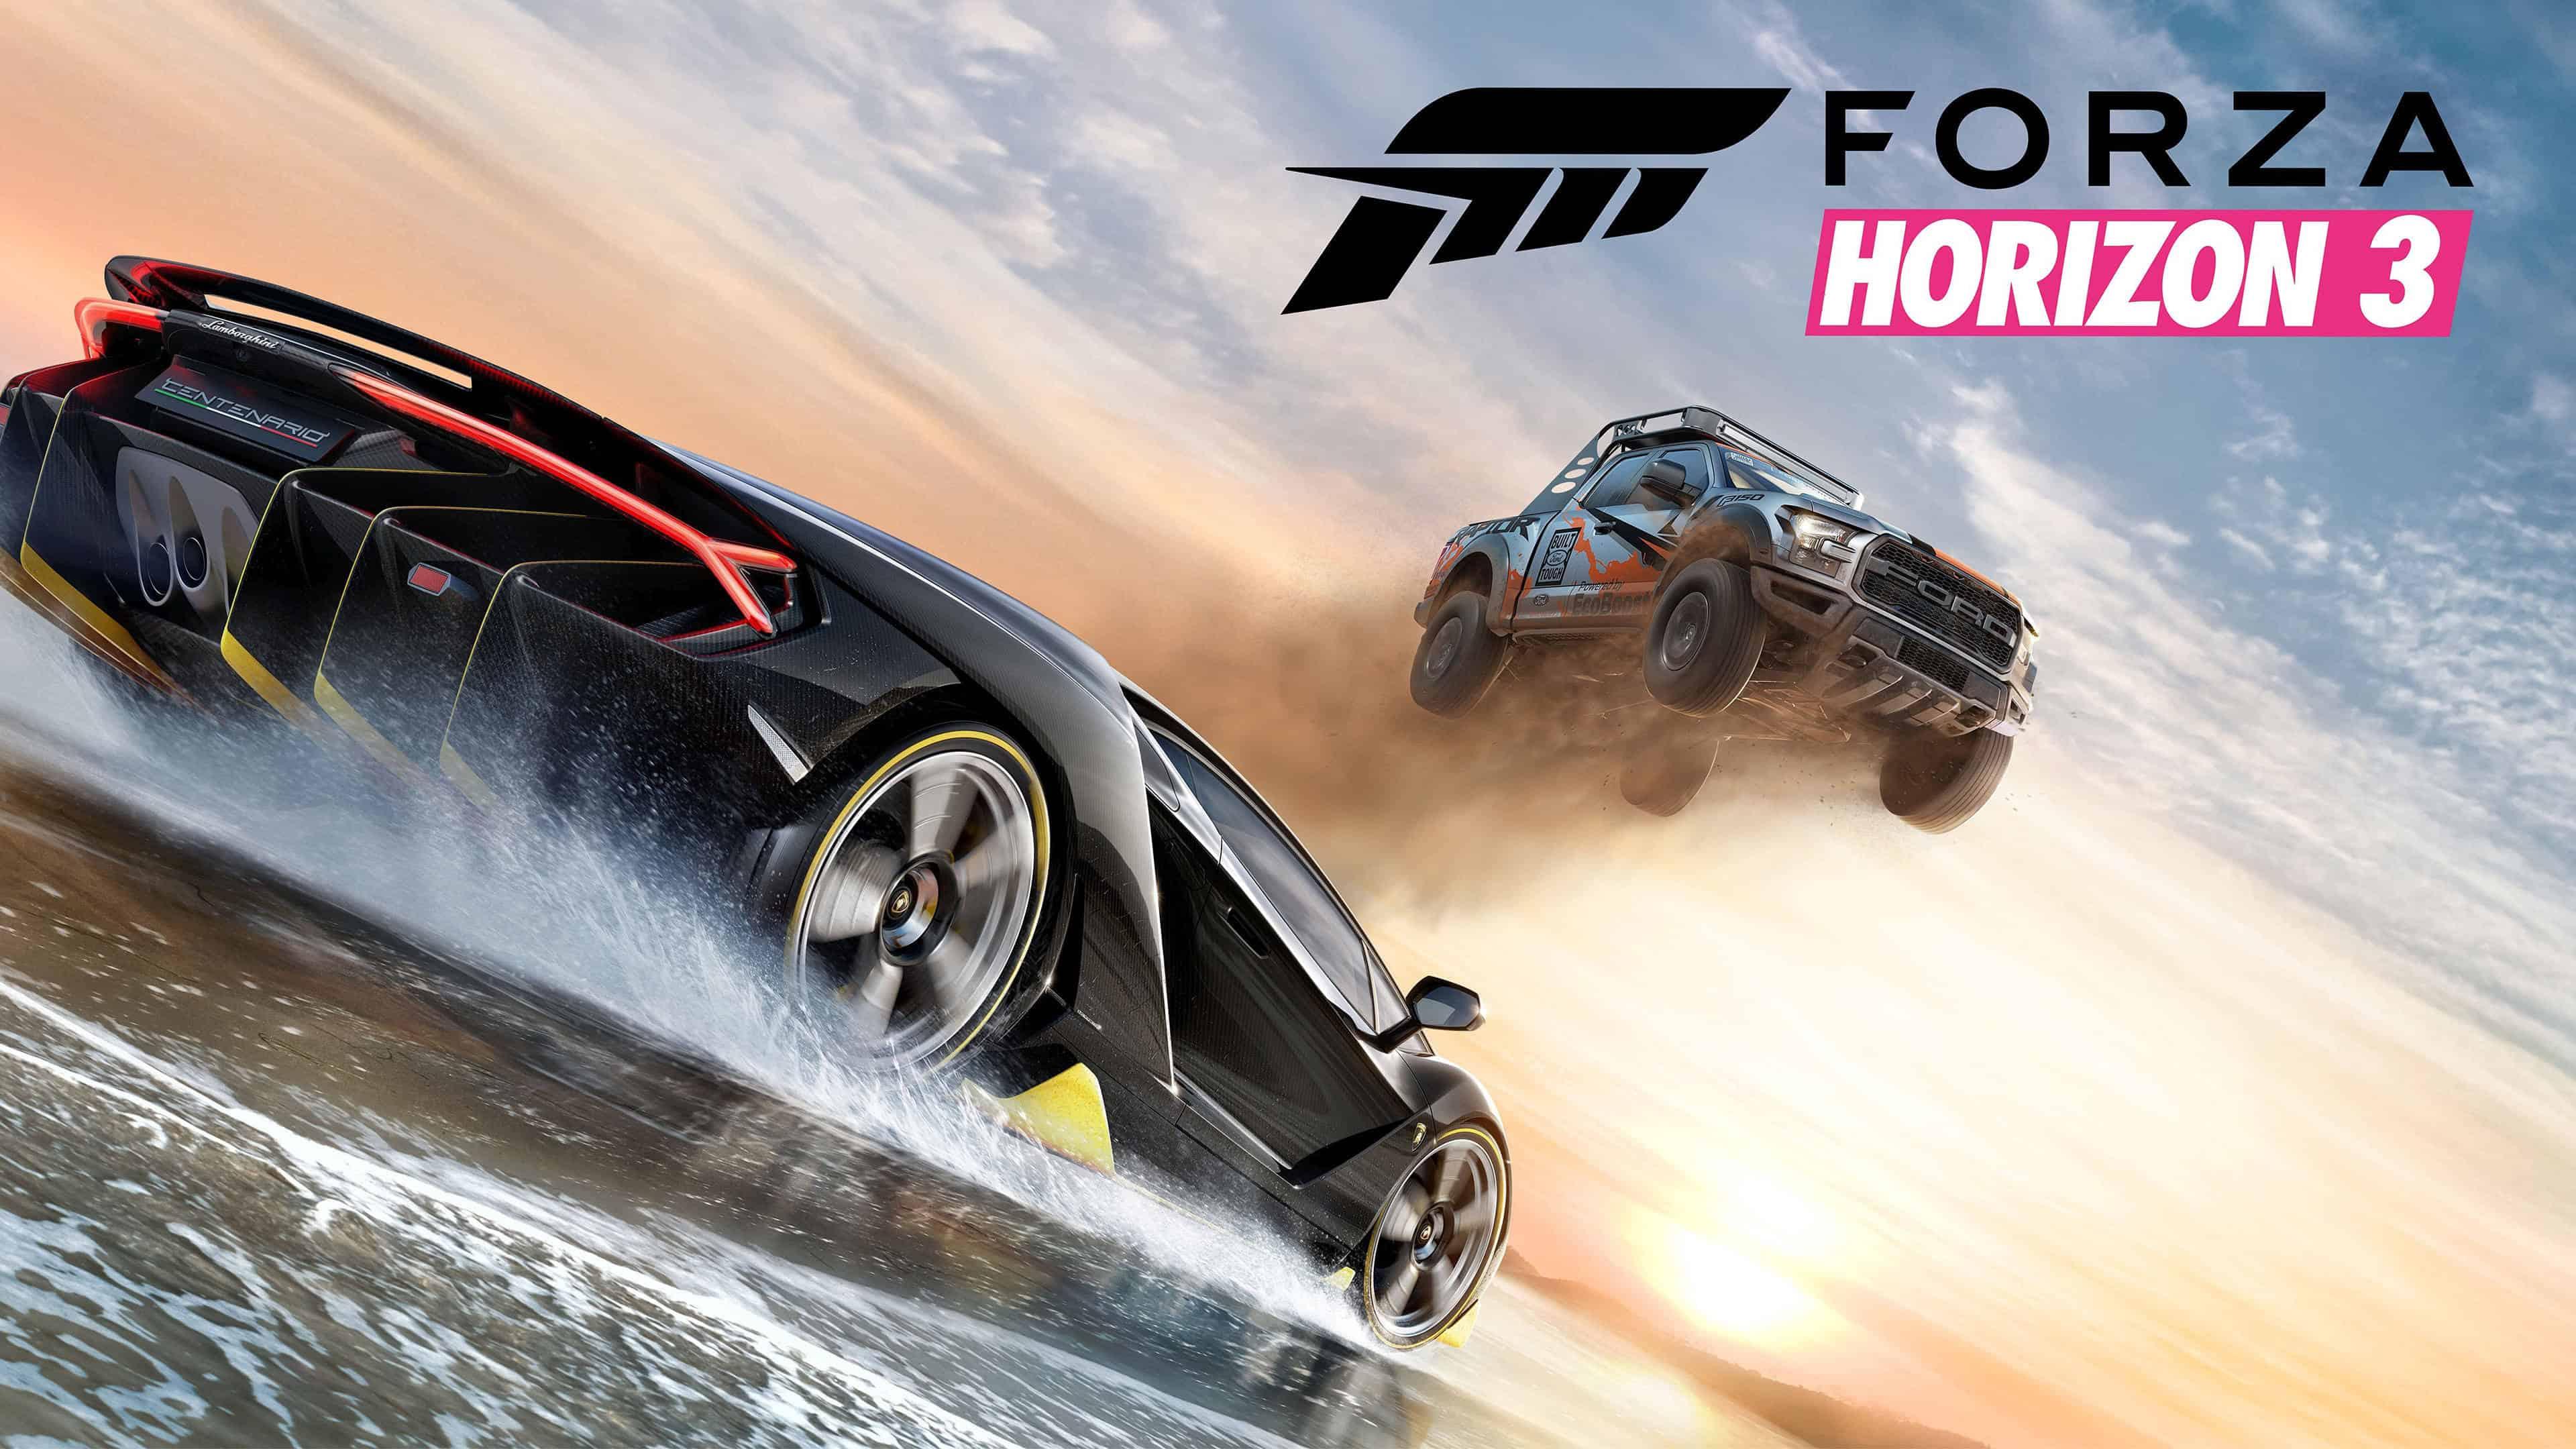 Forza Horizon 3 Uhd 4k Wallpaper